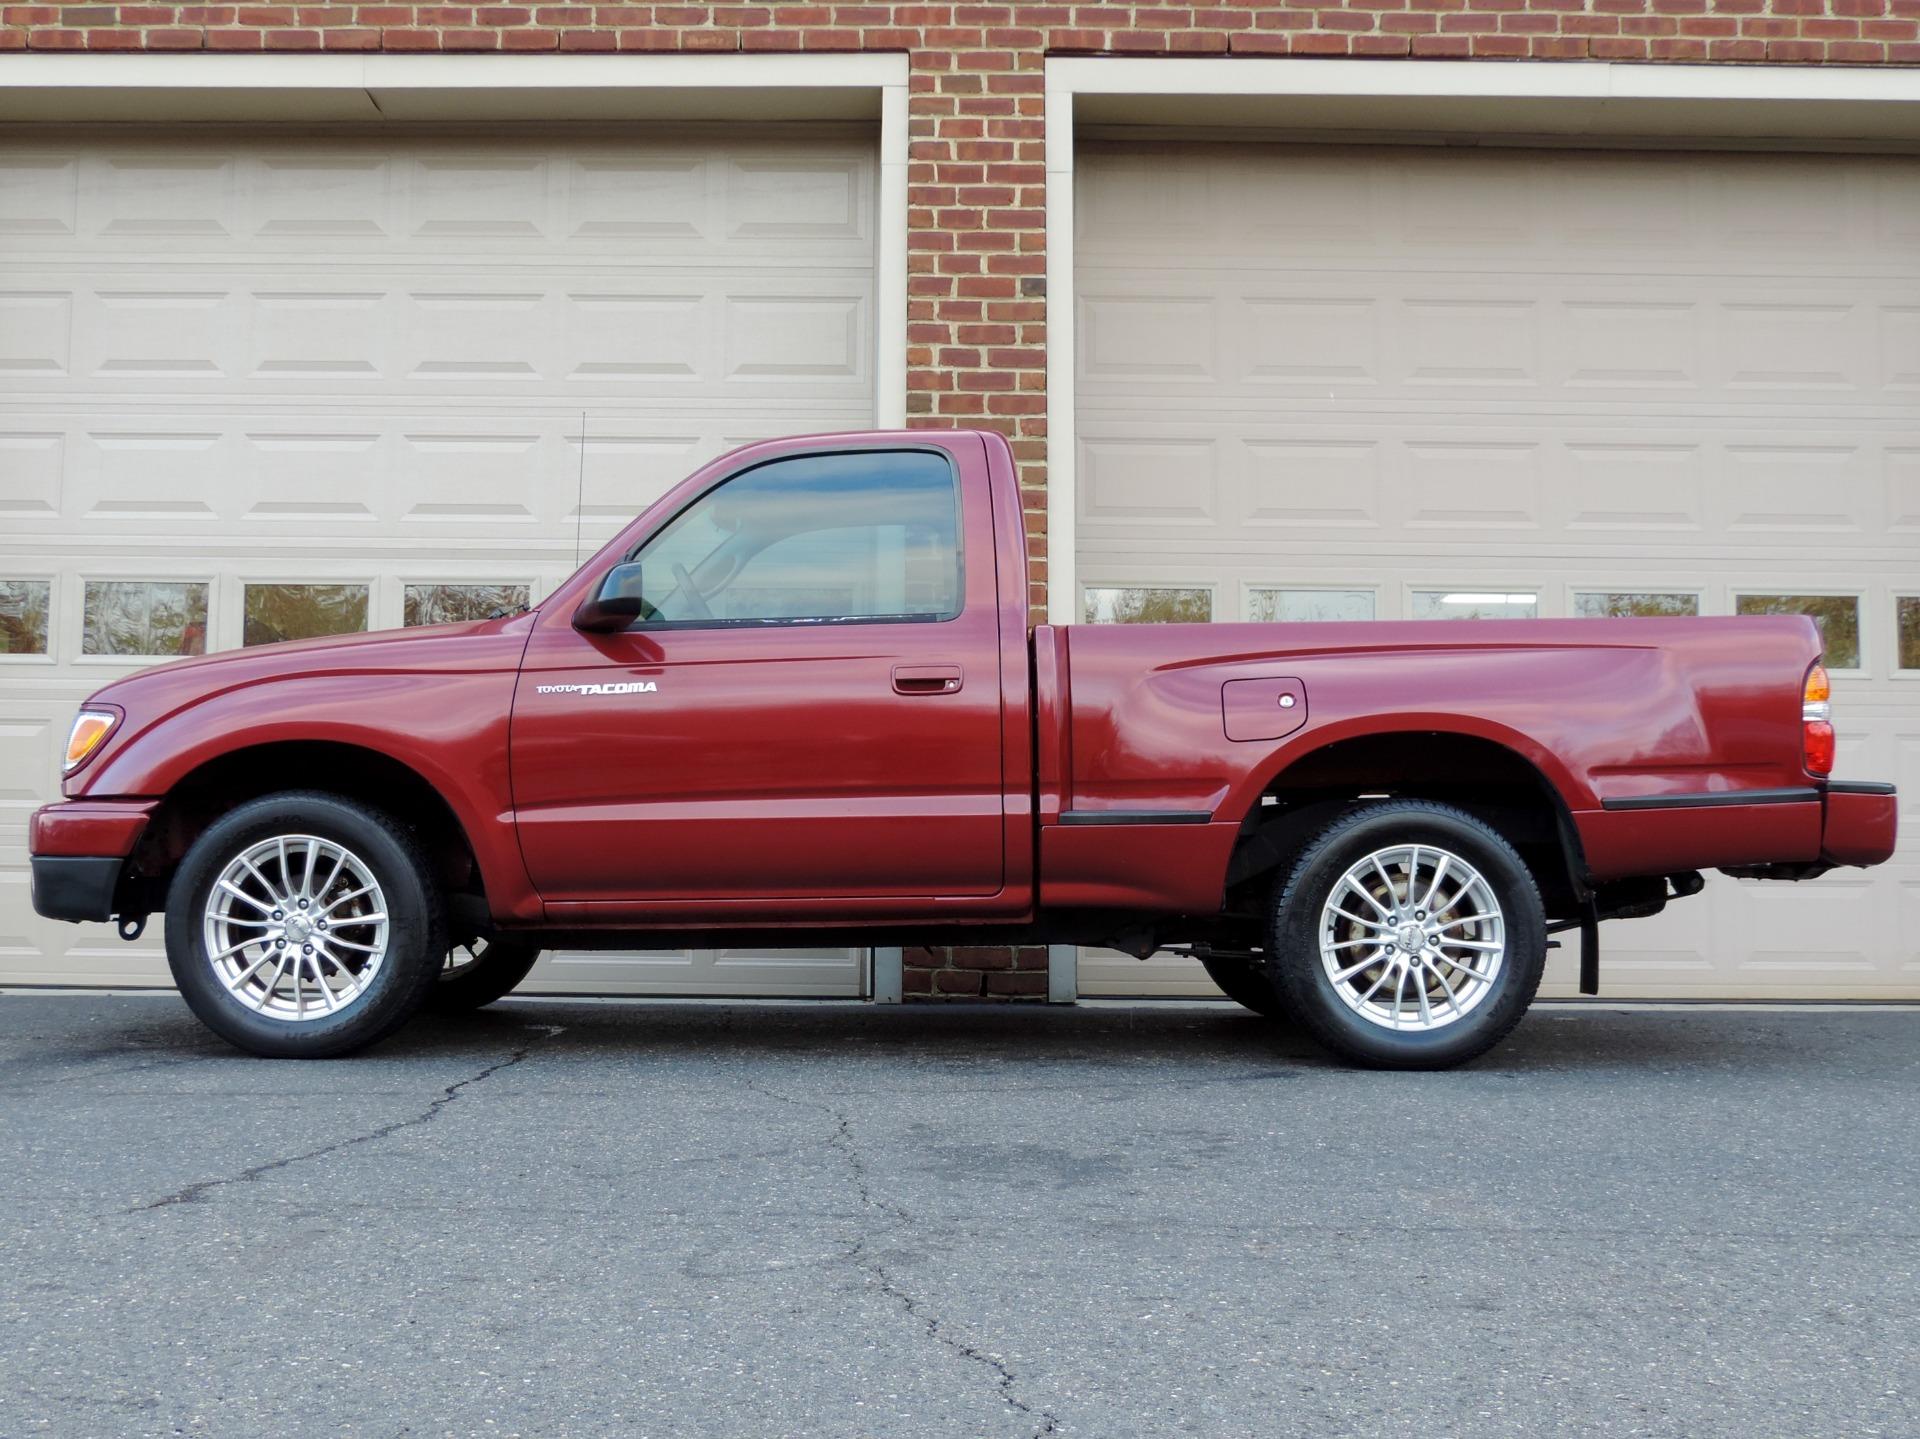 Used-2001-Toyota-Tacoma-Stepside